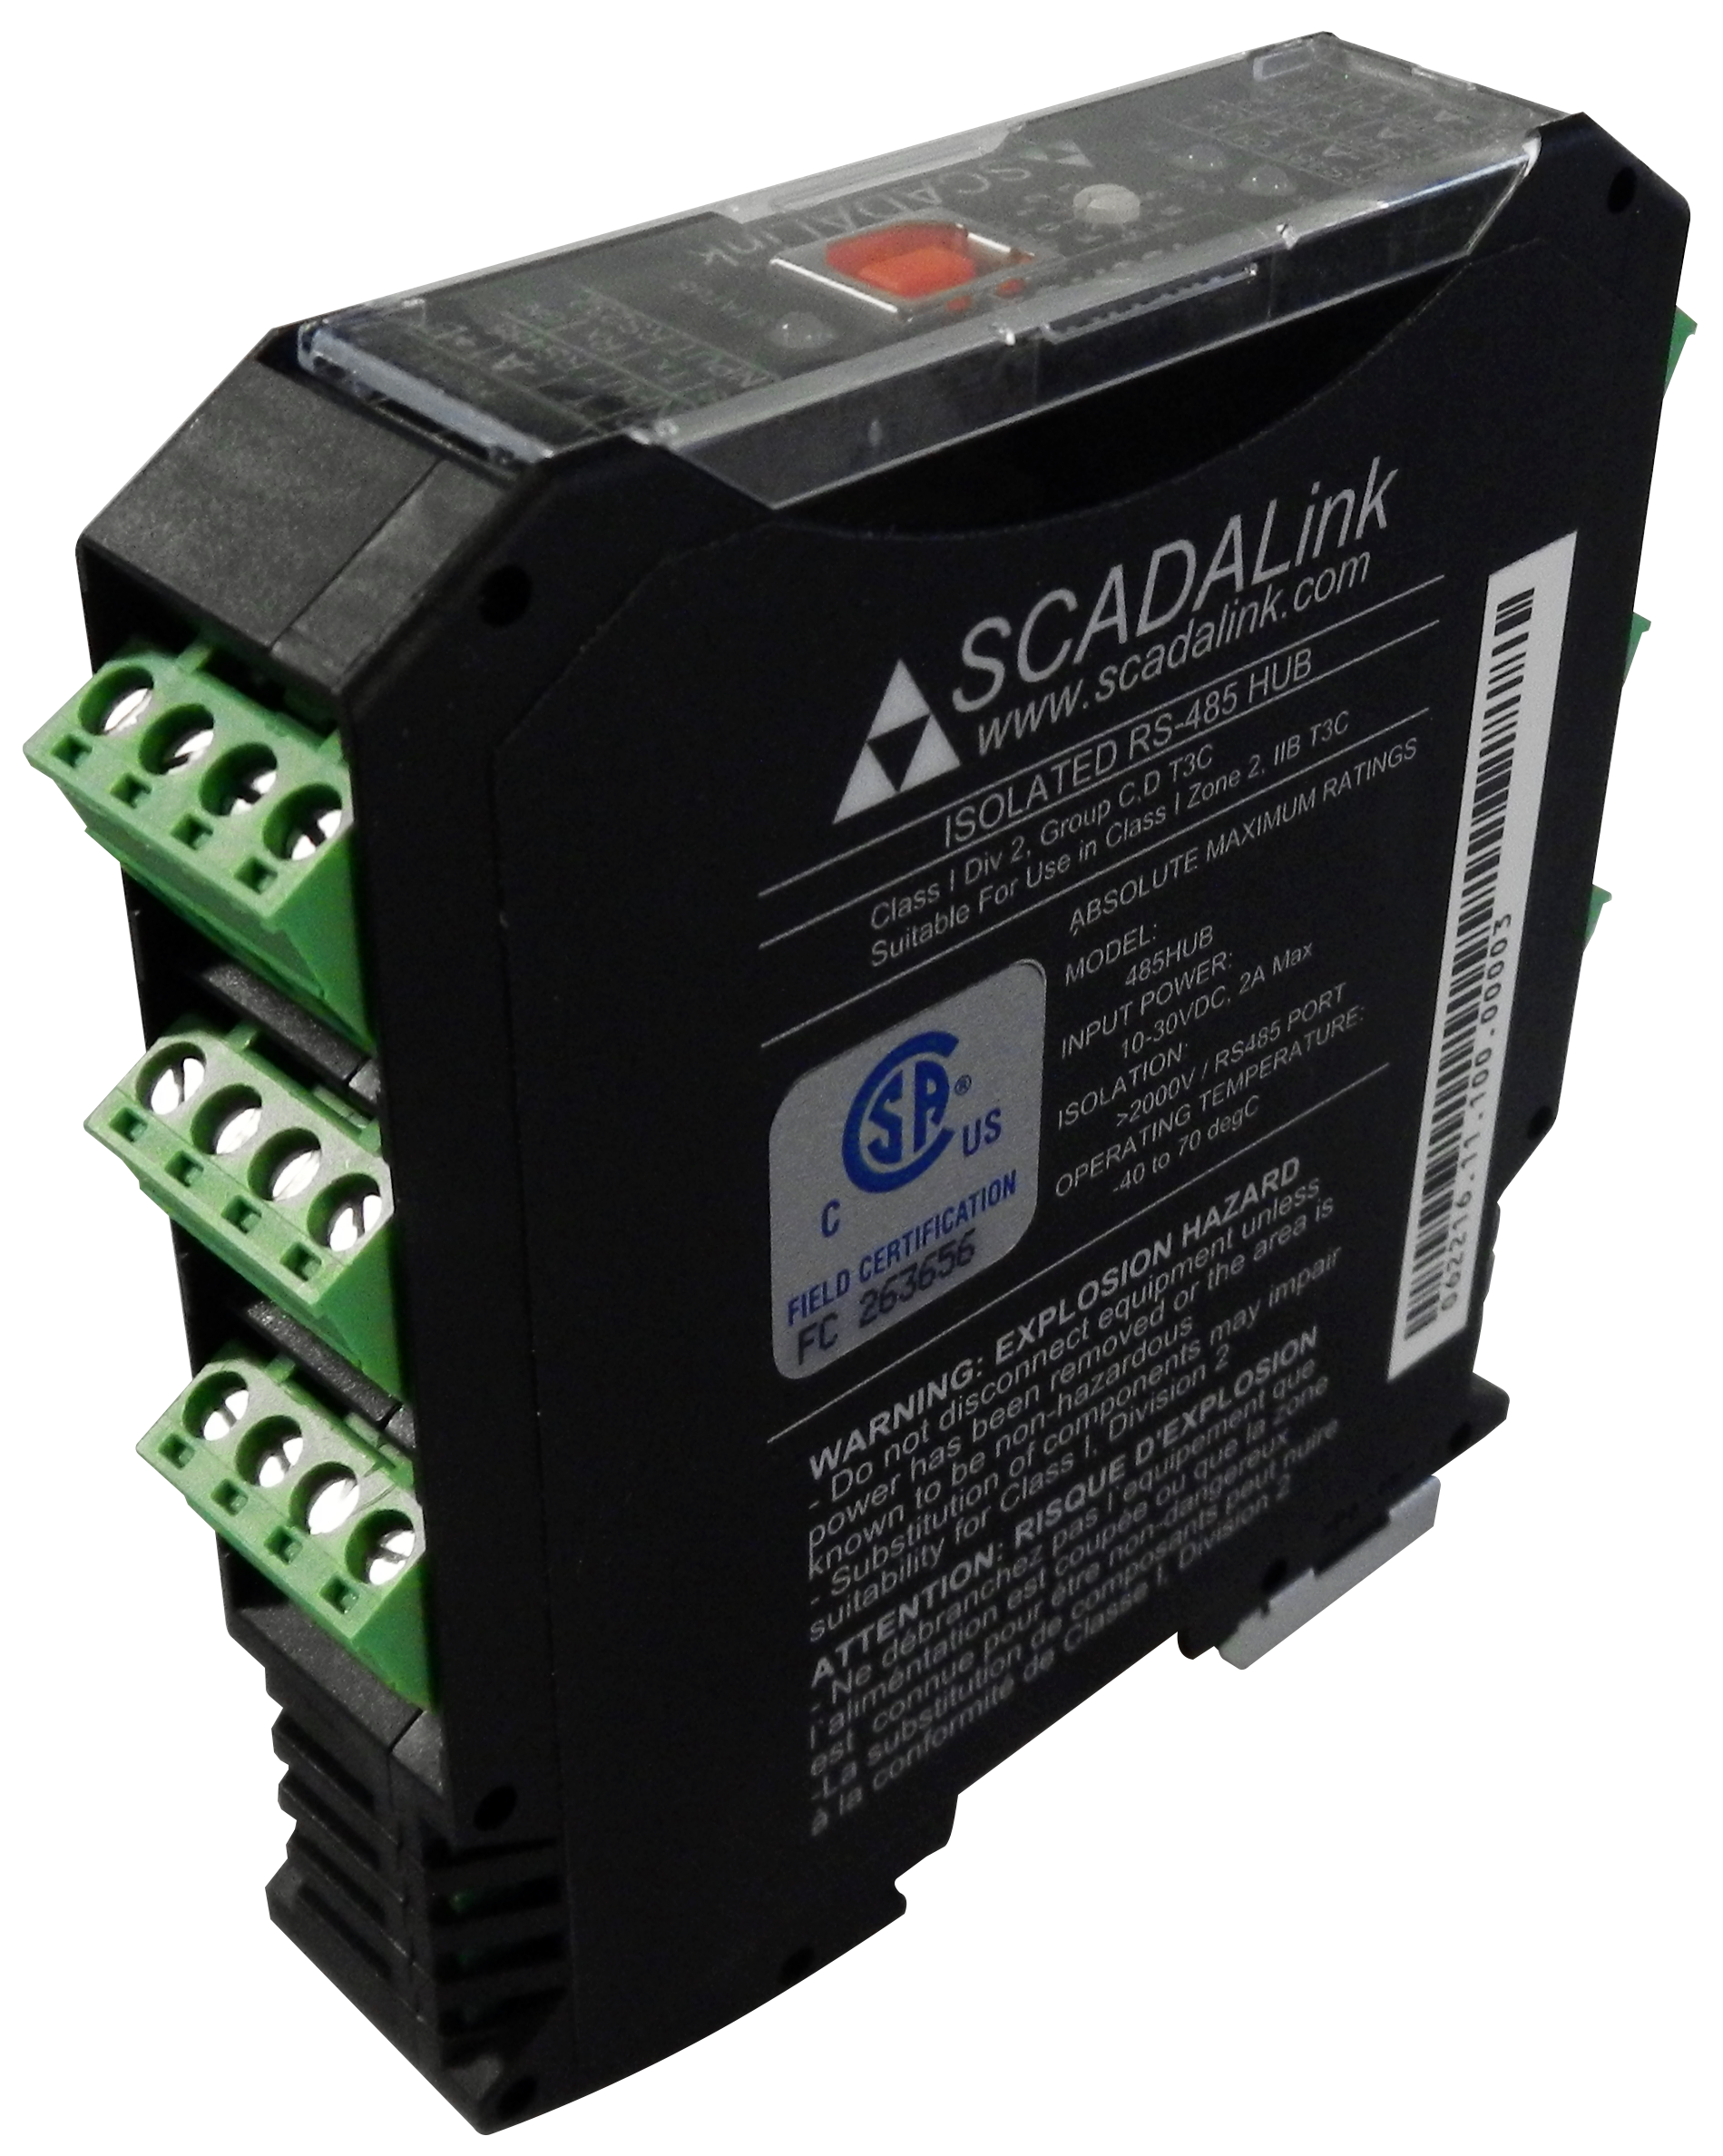 SCADALink RS485 HUB